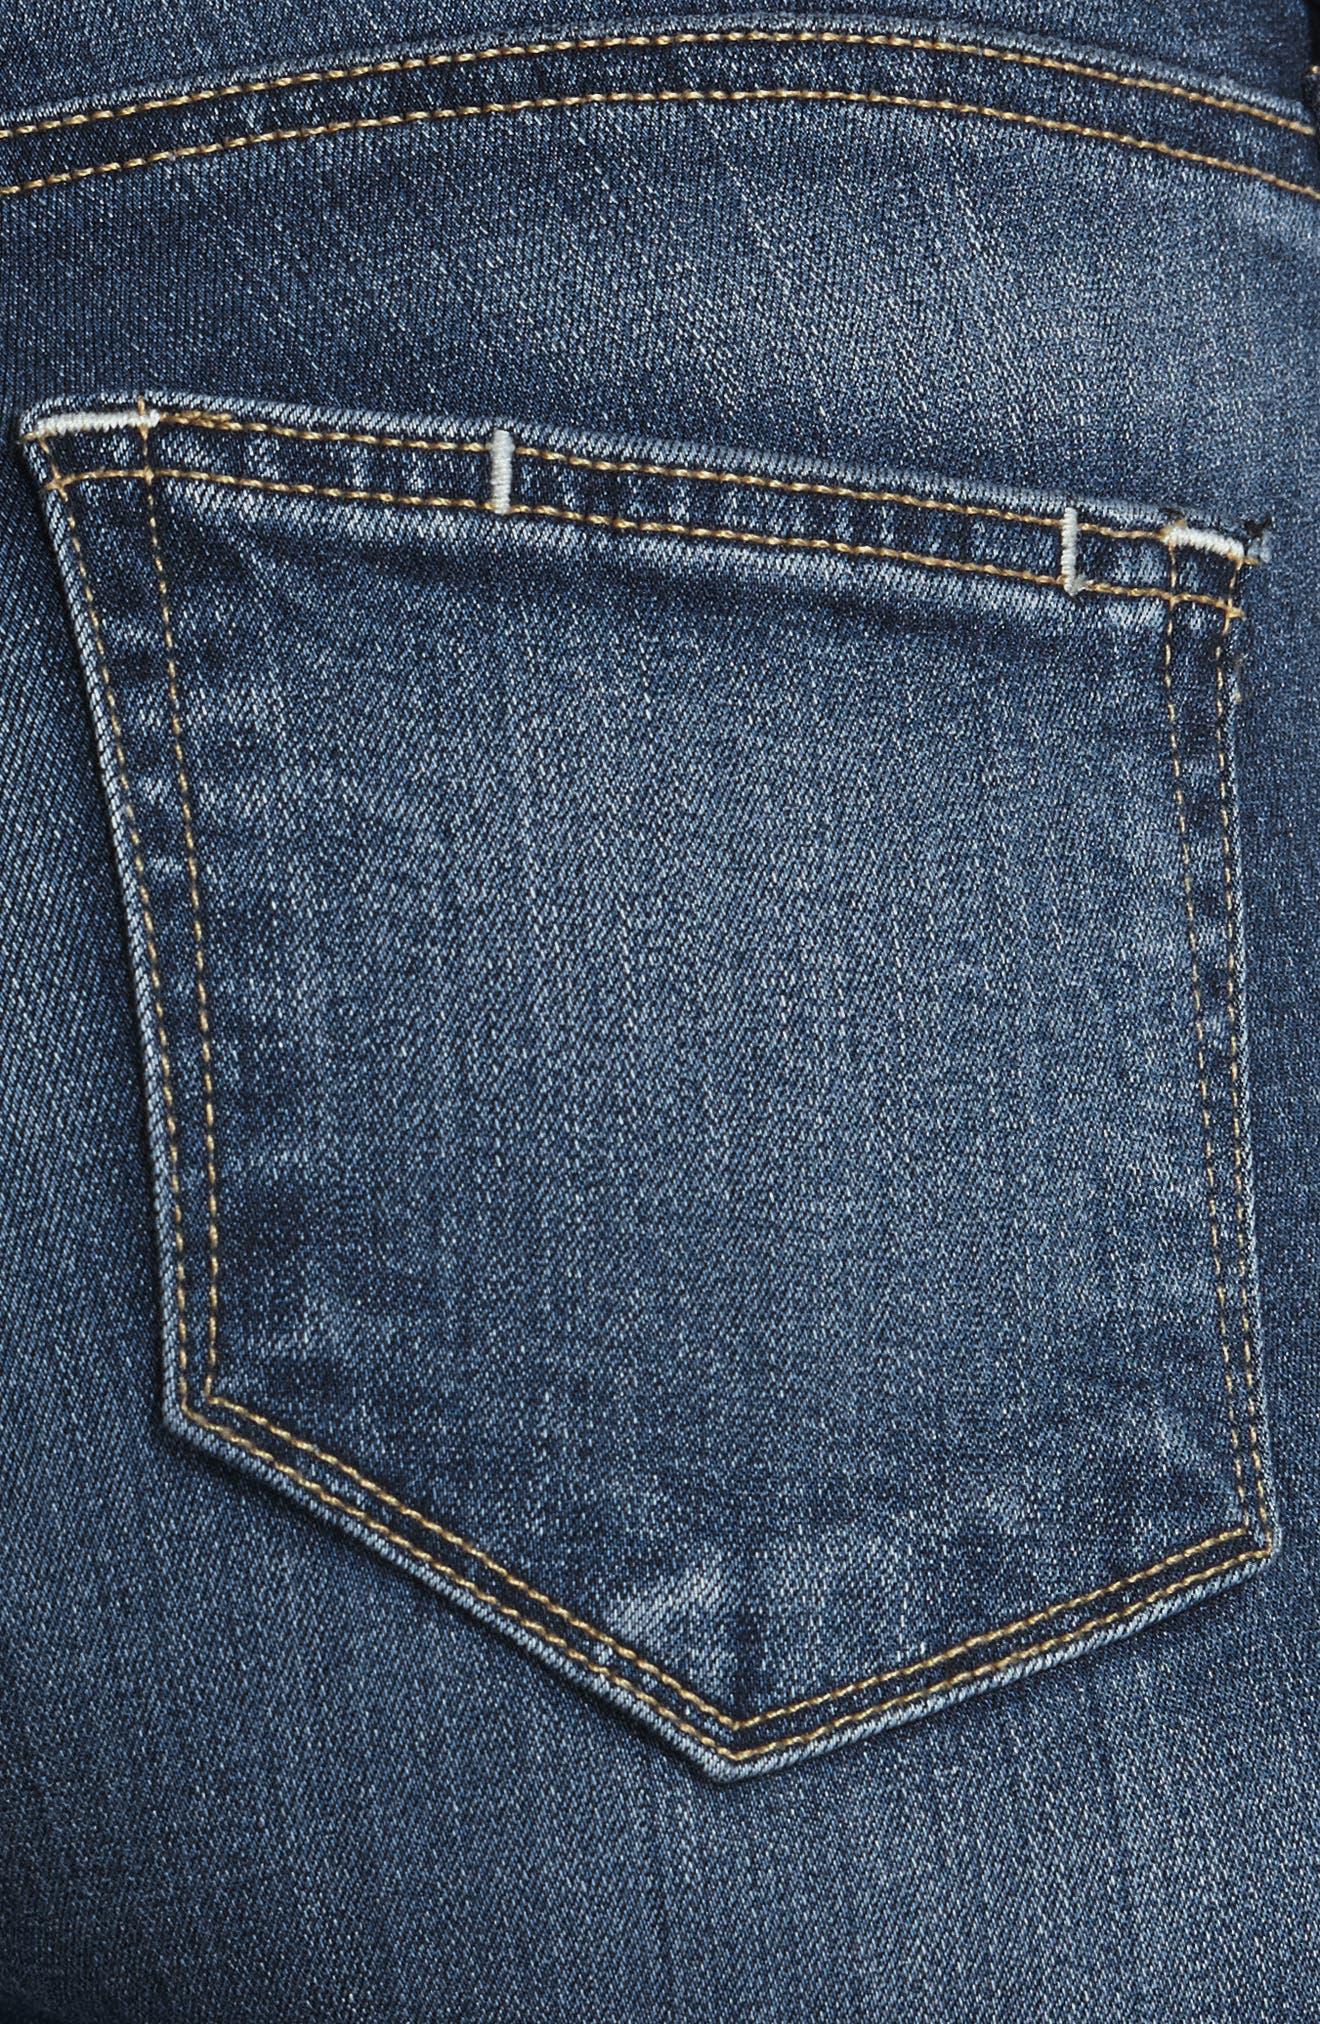 Transcend - Verdugo Ankle Skinny Jeans,                             Alternate thumbnail 4, color,                             TRISTAN